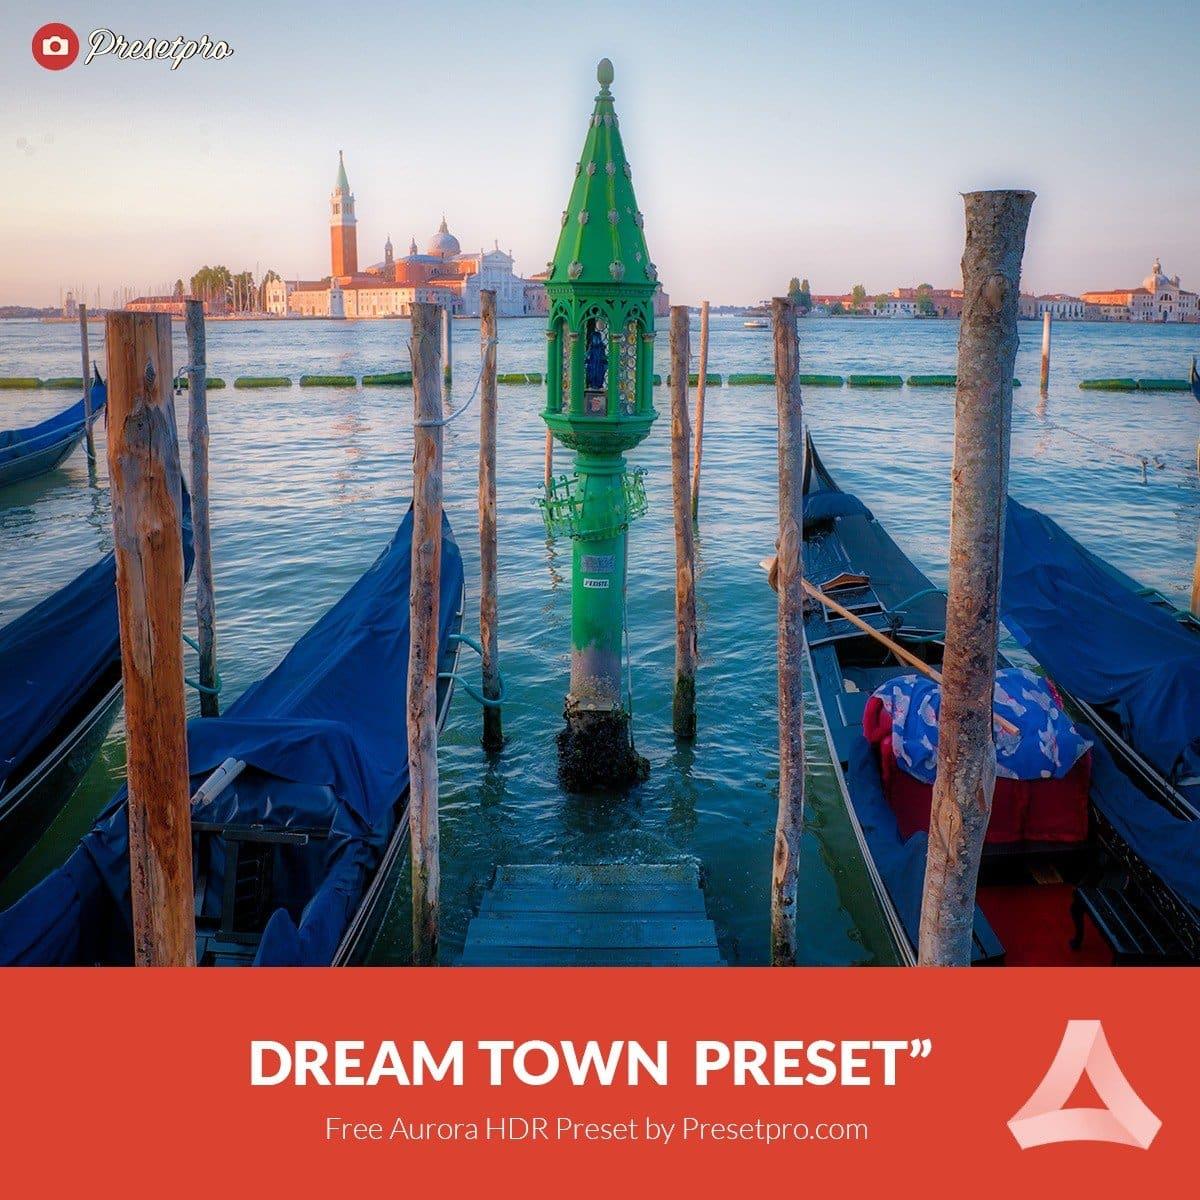 Free-Aurora-HDR-Preset-Dream-Town-Presetpro